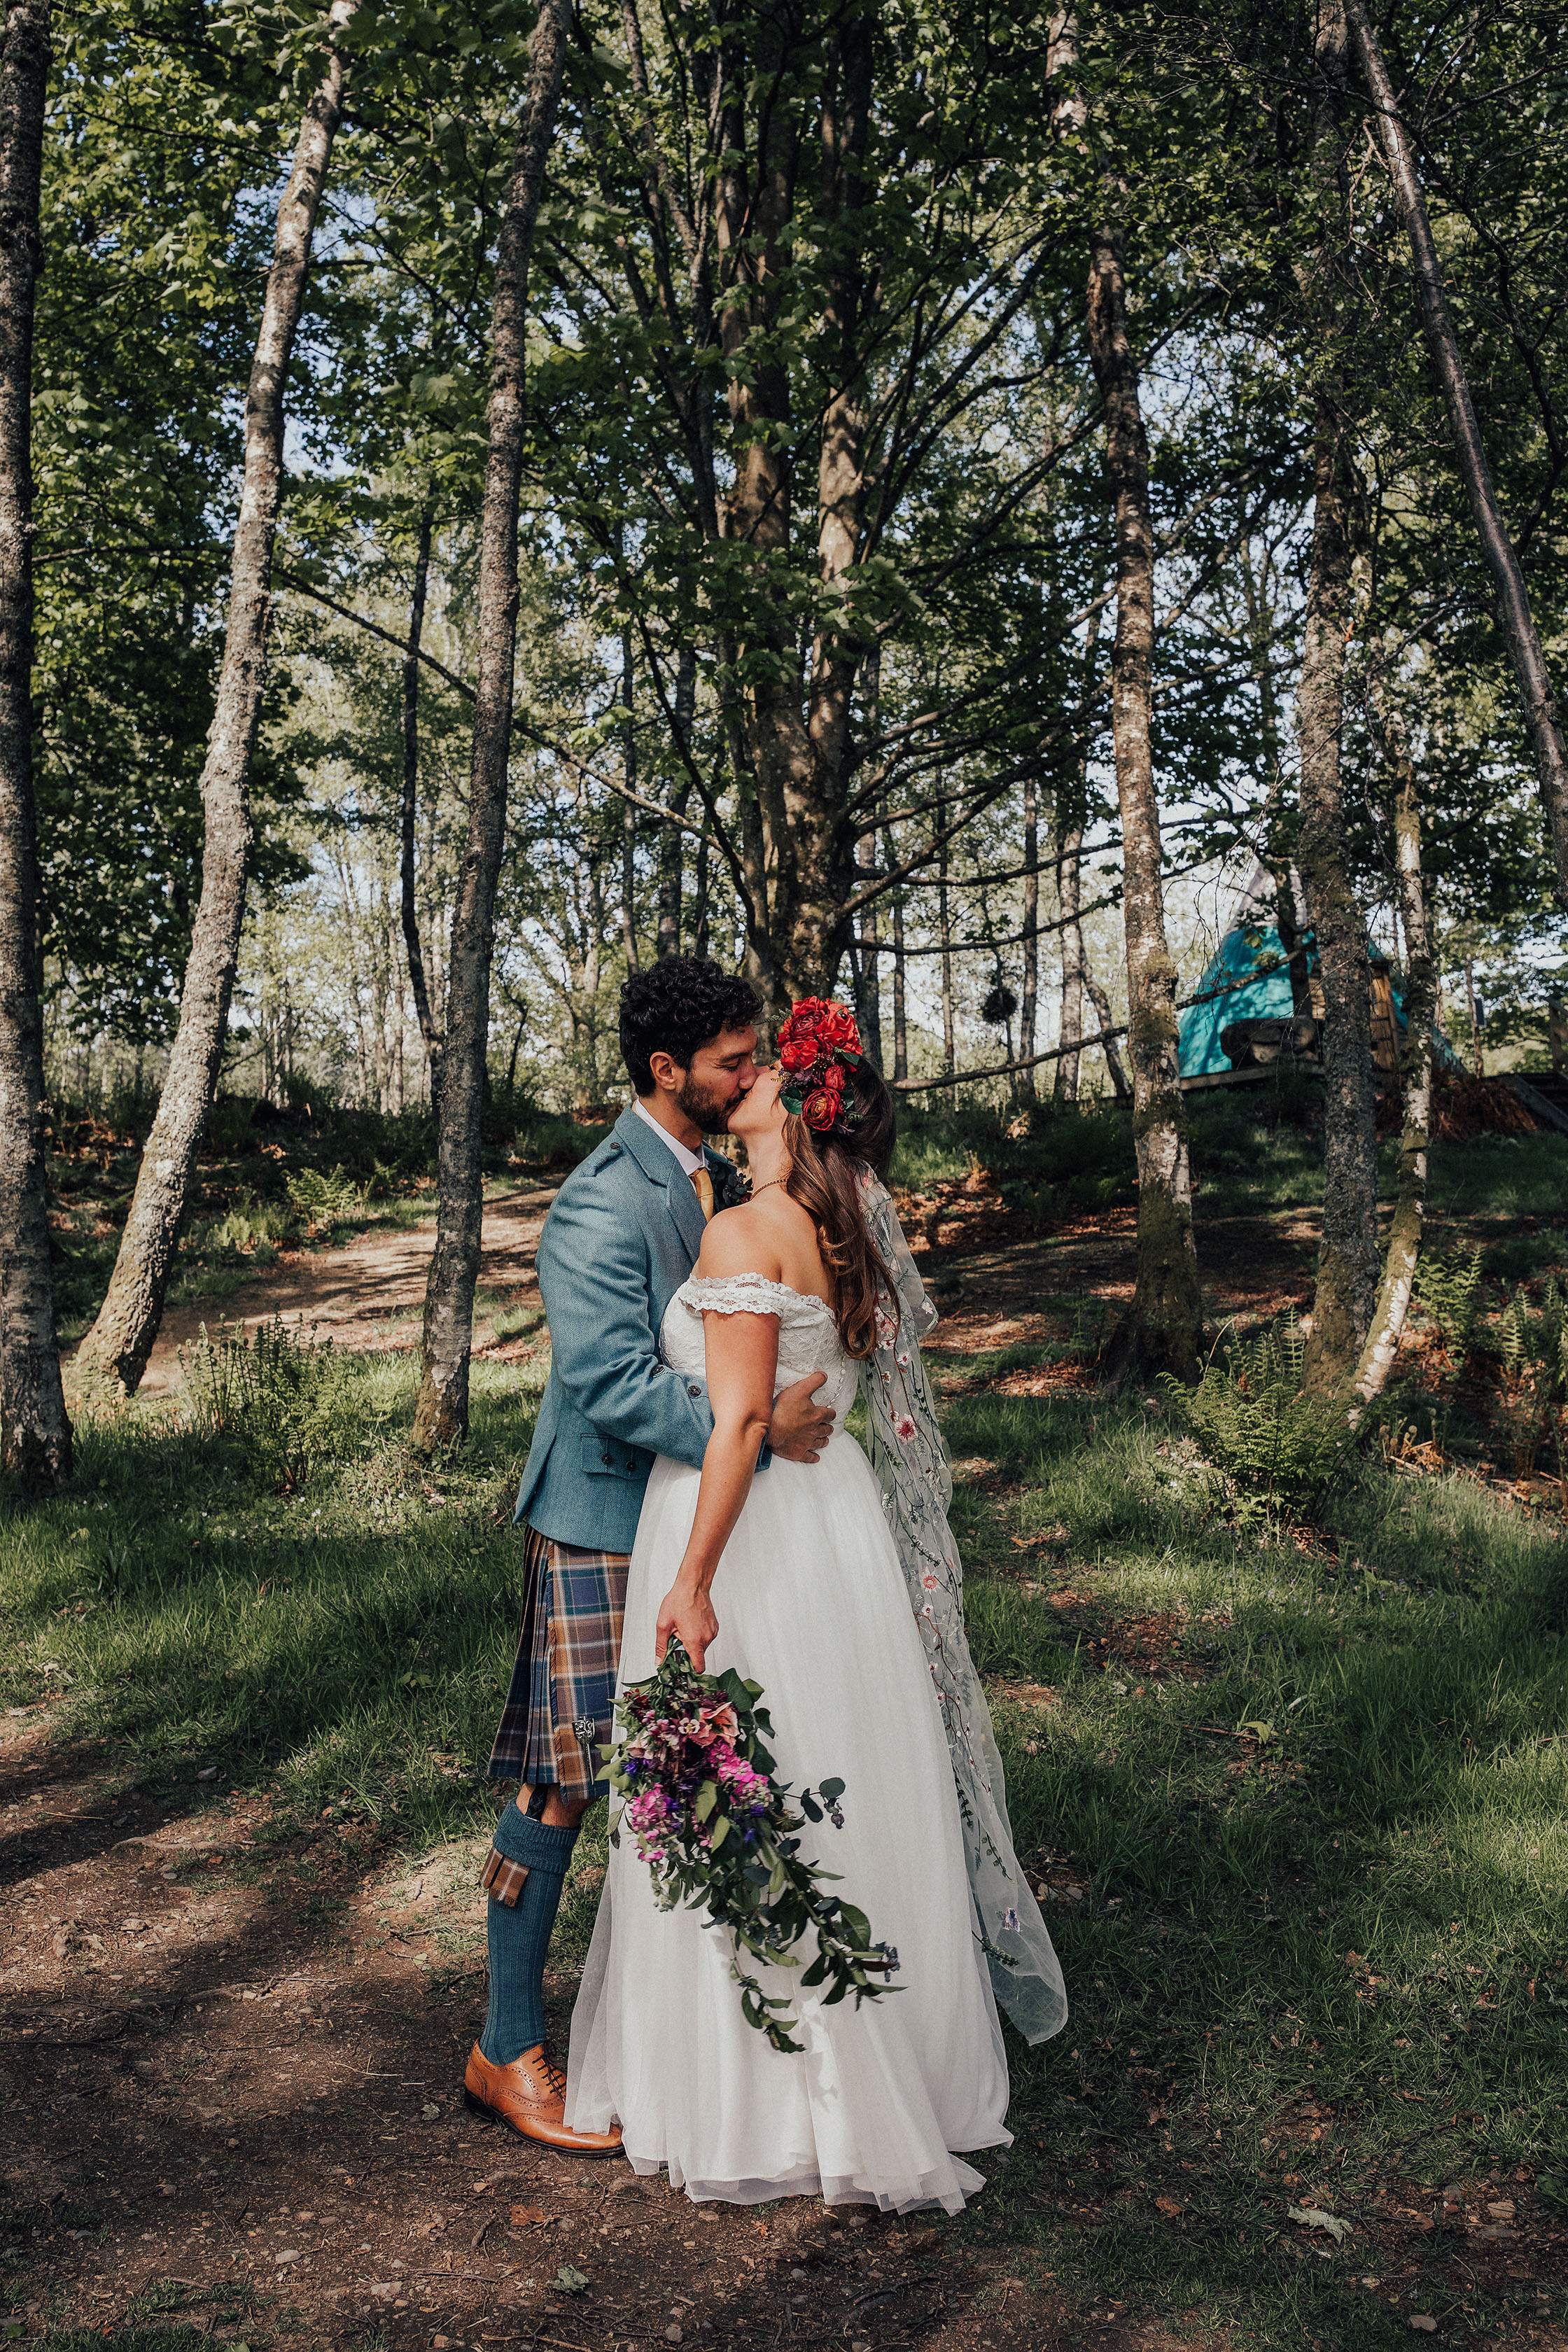 COMRIE_CROFT_WEDDINGS_PJ_PHILLIPS_PHOTOGRAPHY_101.jpg